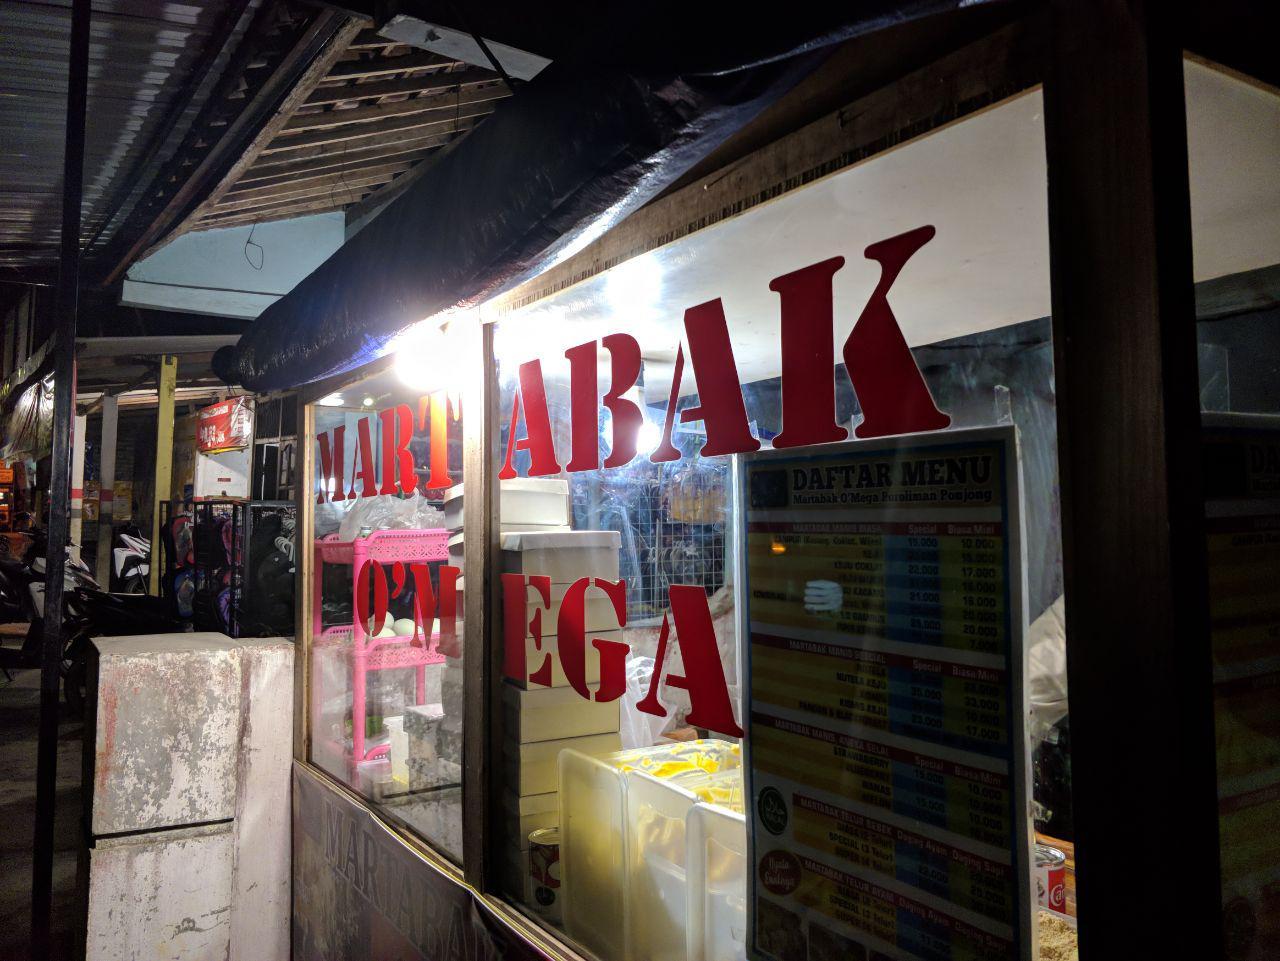 Martabak Omega Proliman Ponjong